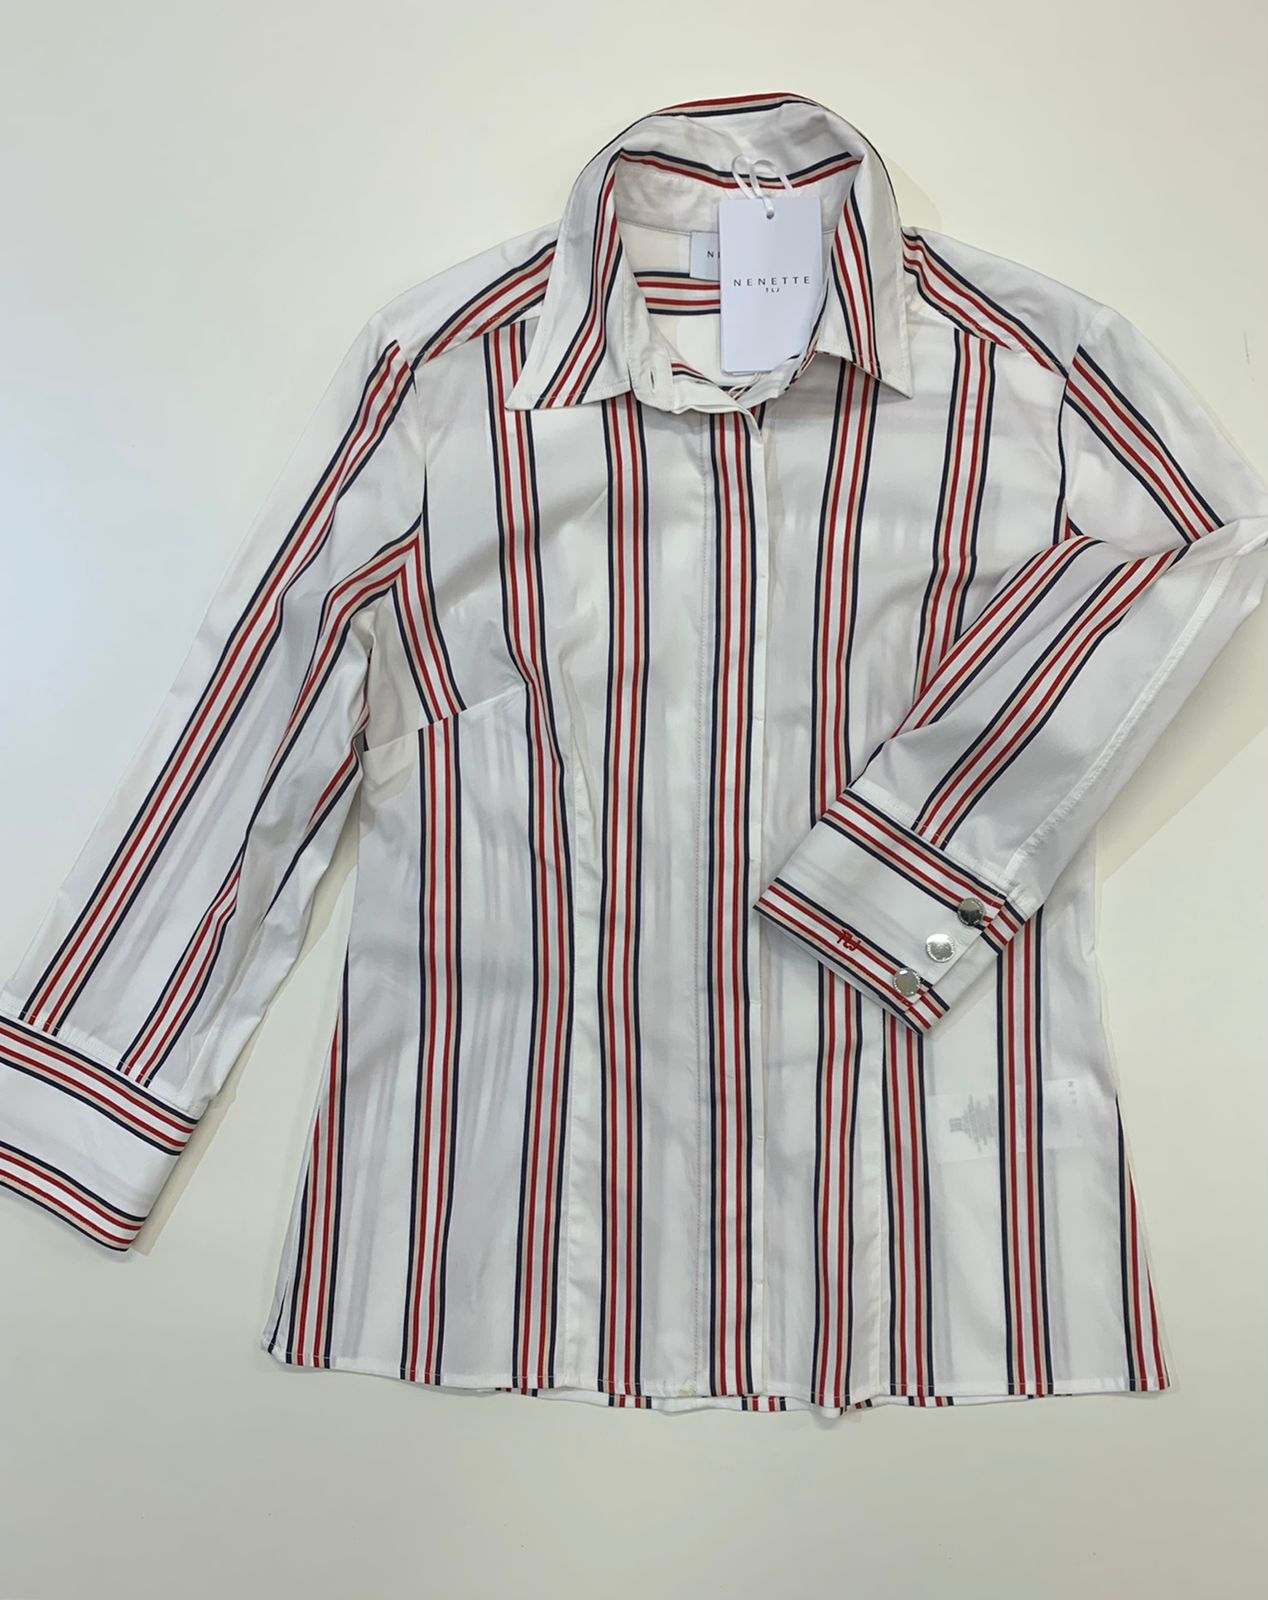 Camicia Tous Les Jours Fama Bianco Rosso Blu